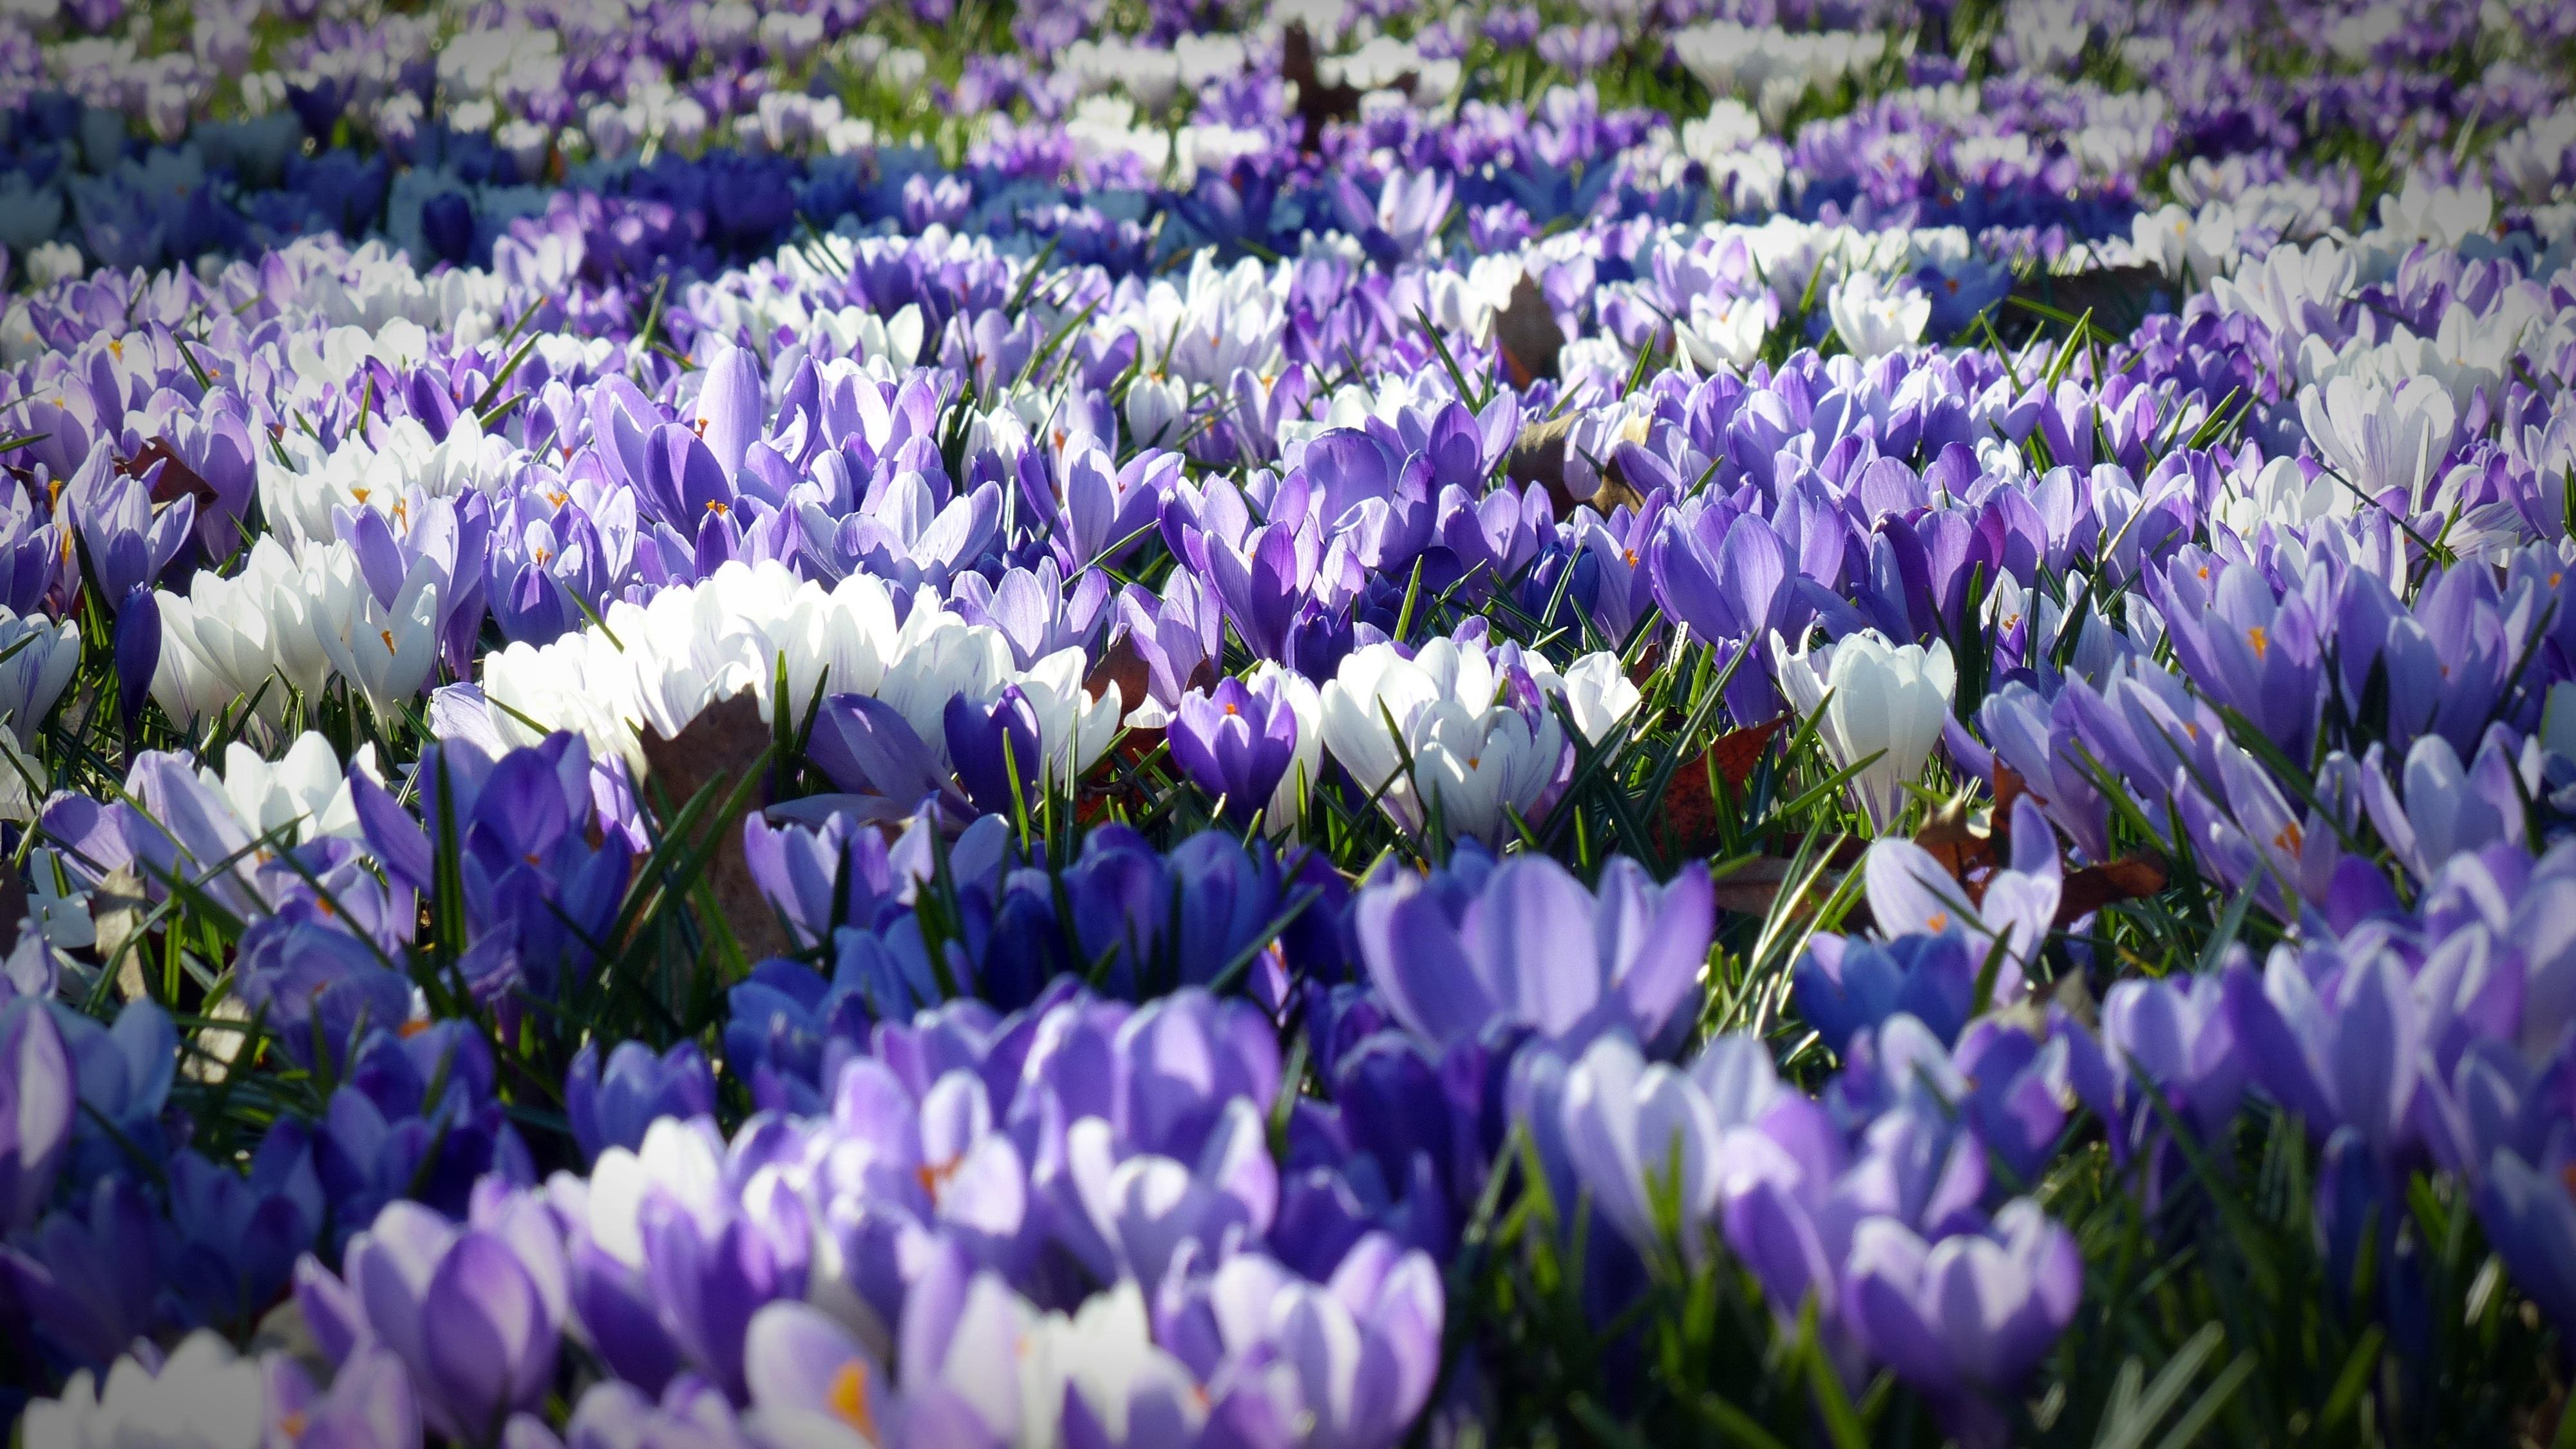 Merveilleux Nature Plant Flower Spring Garden Flowers Crocus Spring Flower Flowering  Plant Sea Of Flowers Early Left